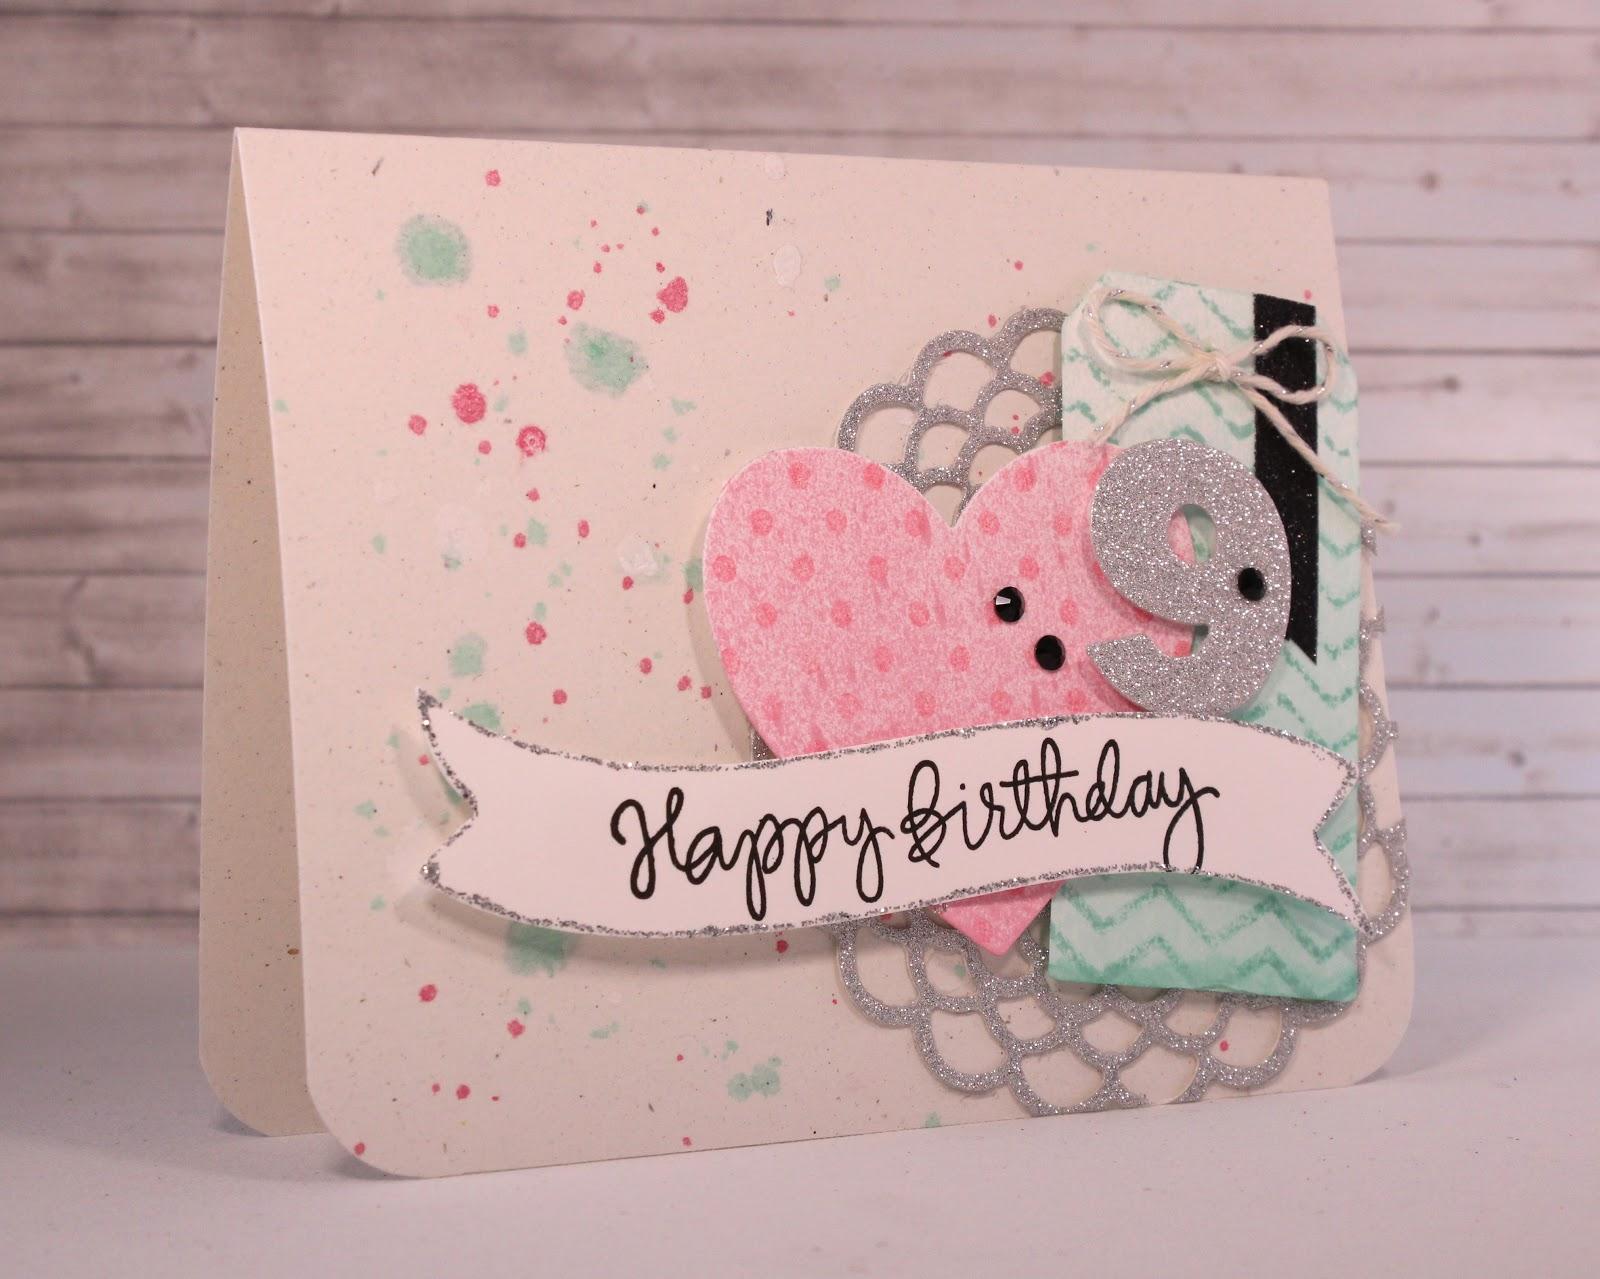 Happy Birthday Layered Die Cuts  002.jpg